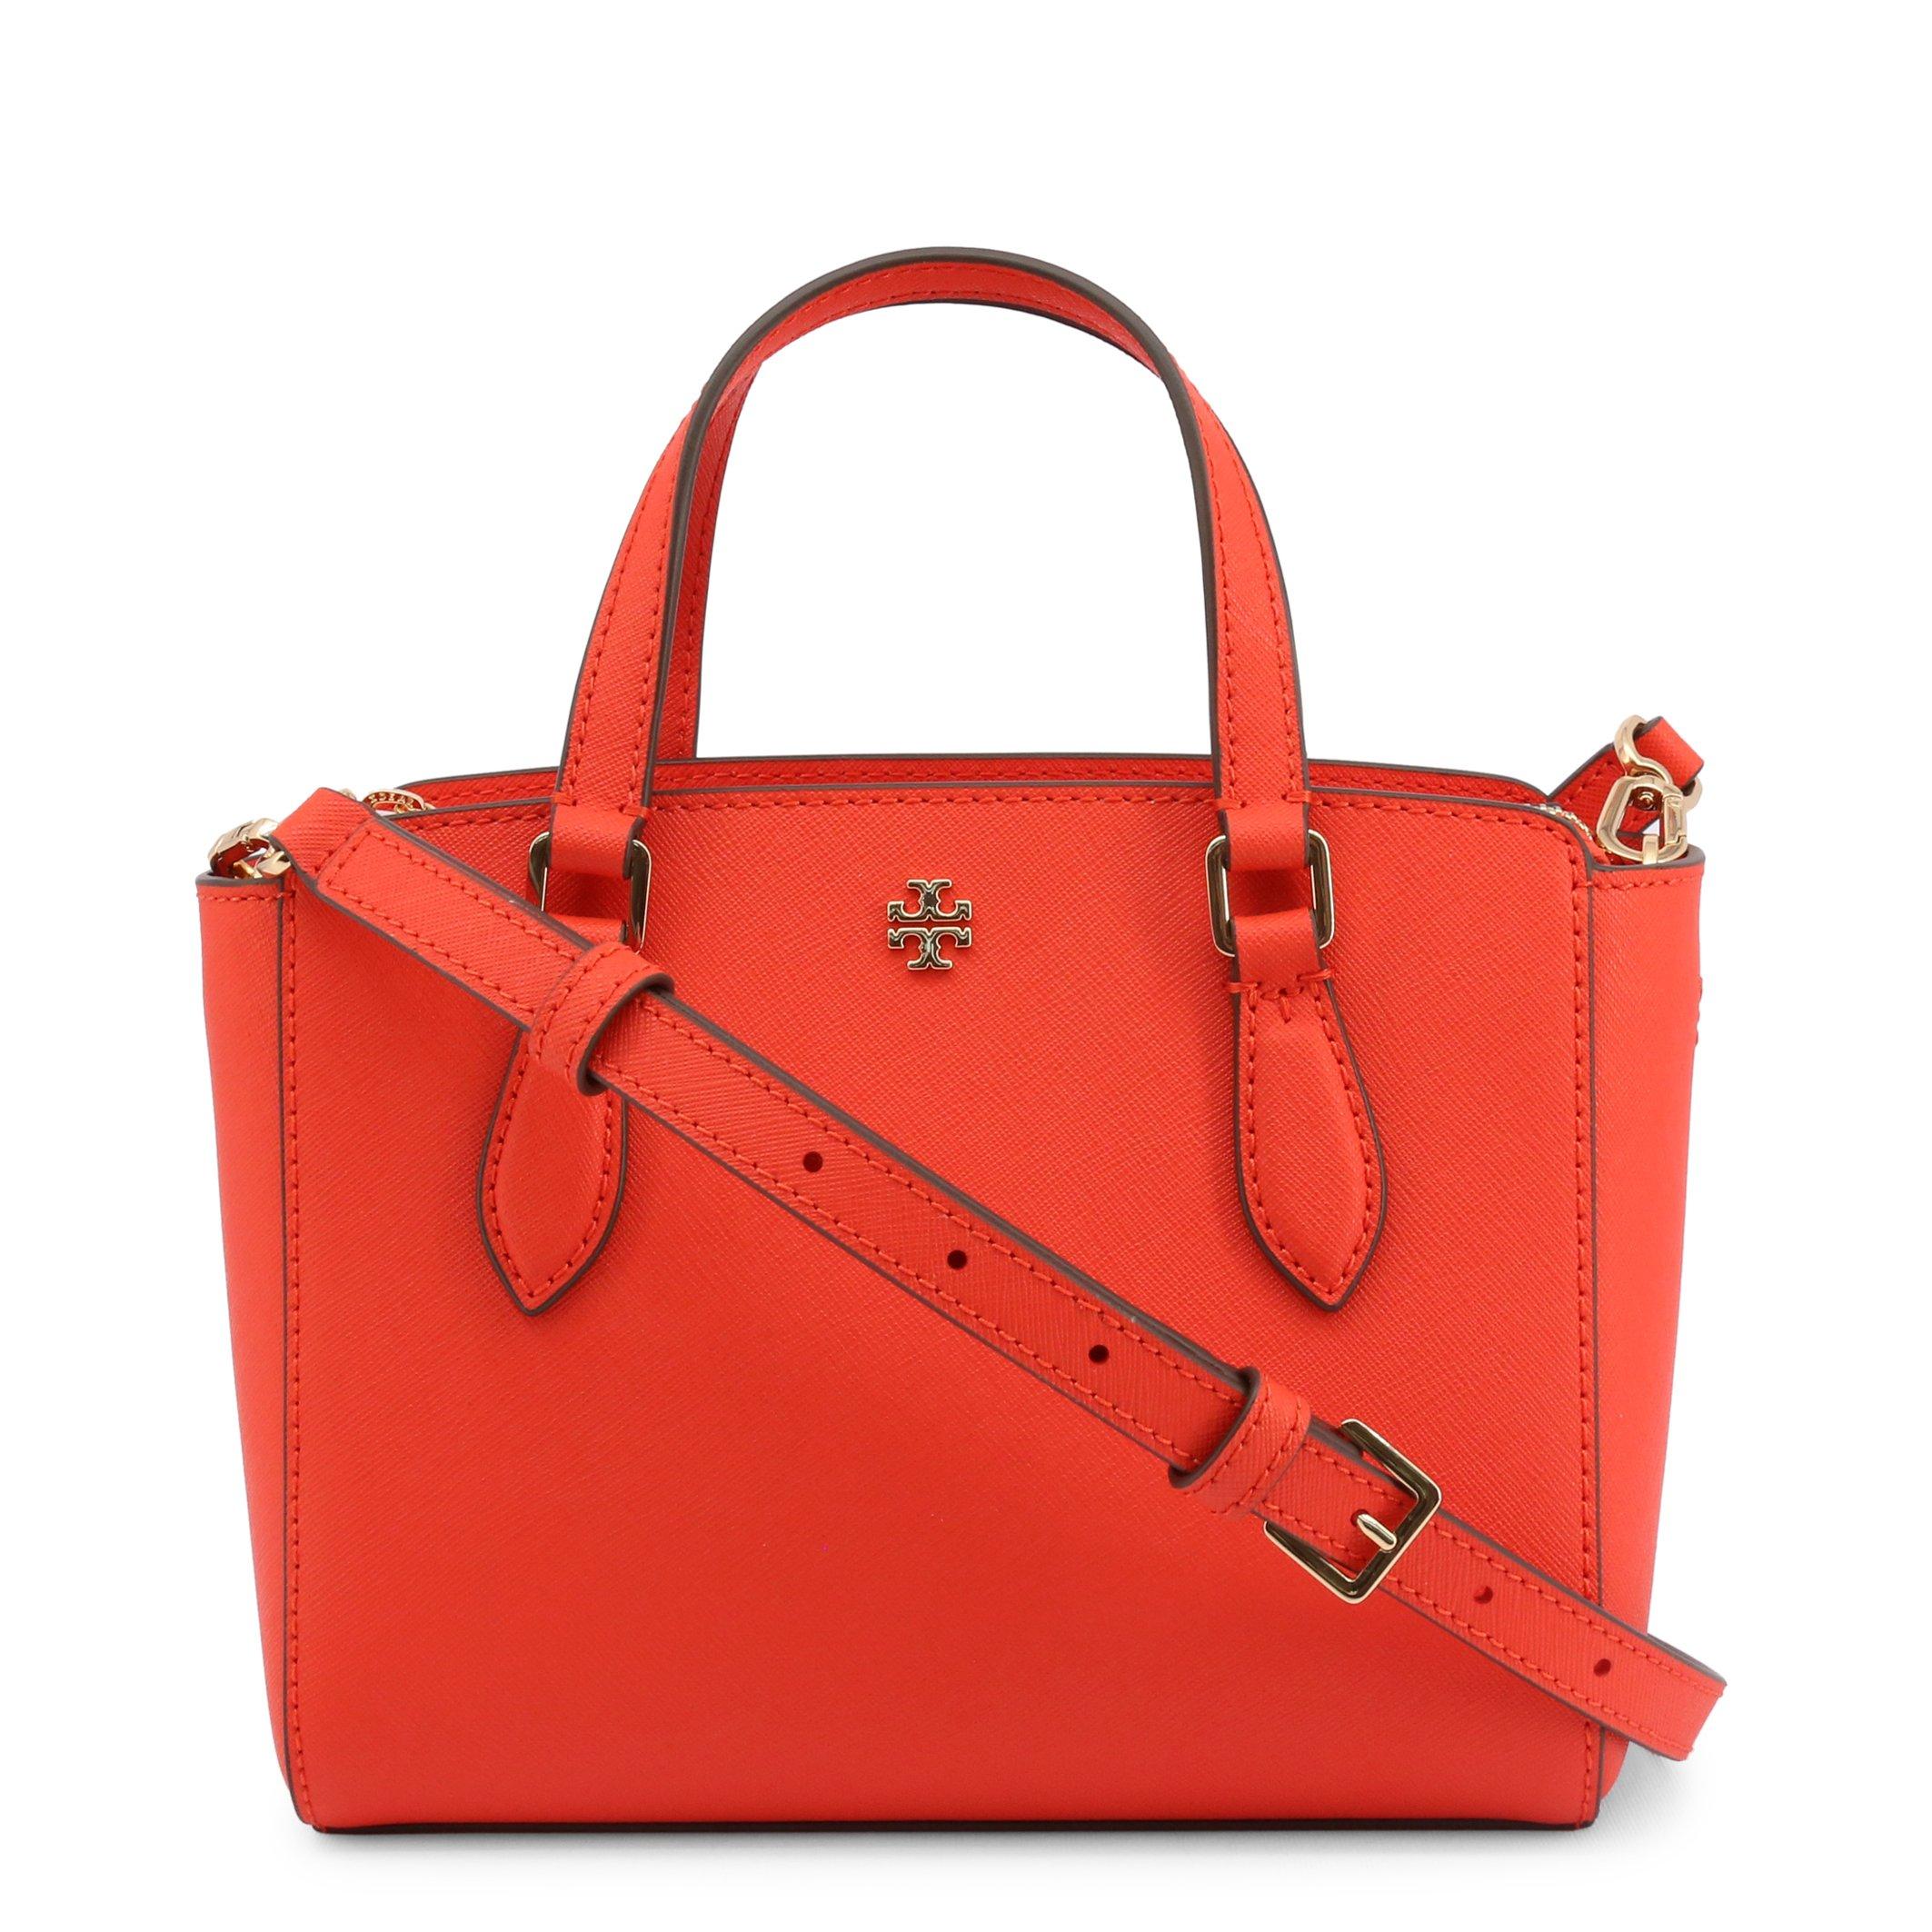 Tory Burch Women's Handbag Various Colours 64189 - red NOSIZE